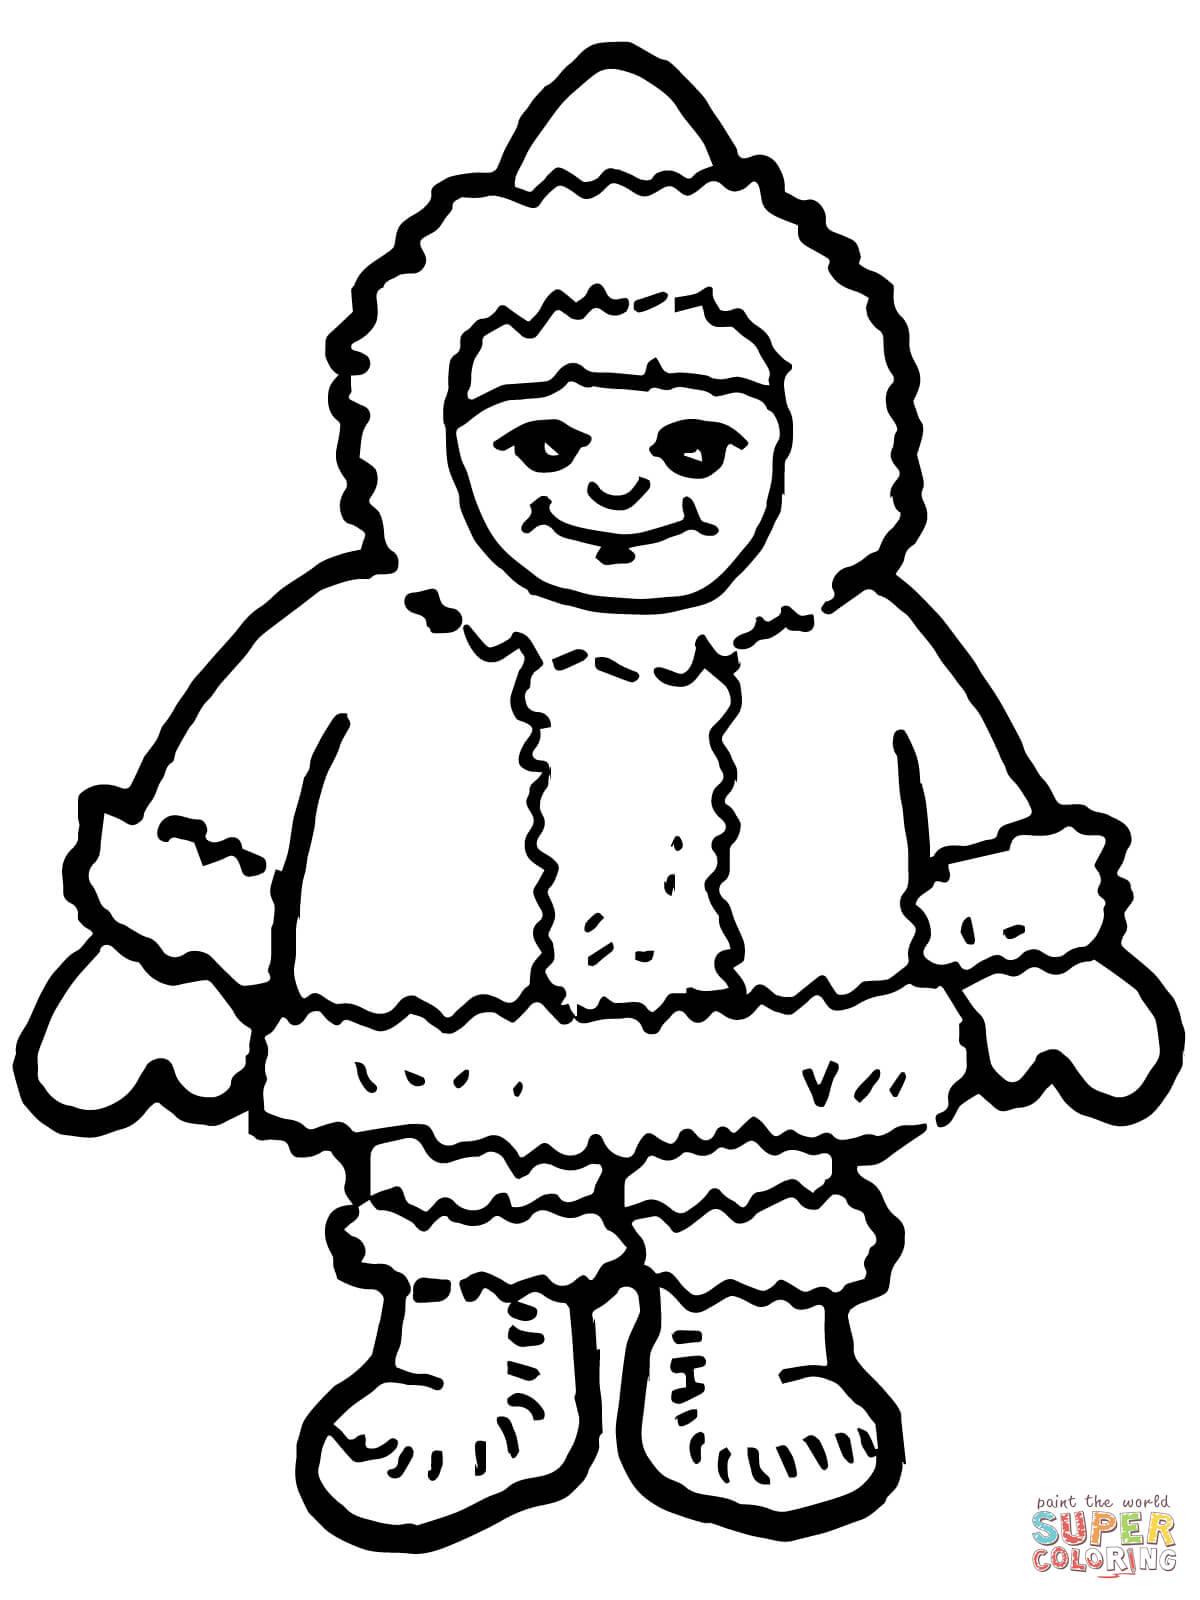 Dibujo De Lindo Nino Esquimal Inuit Para Colorear